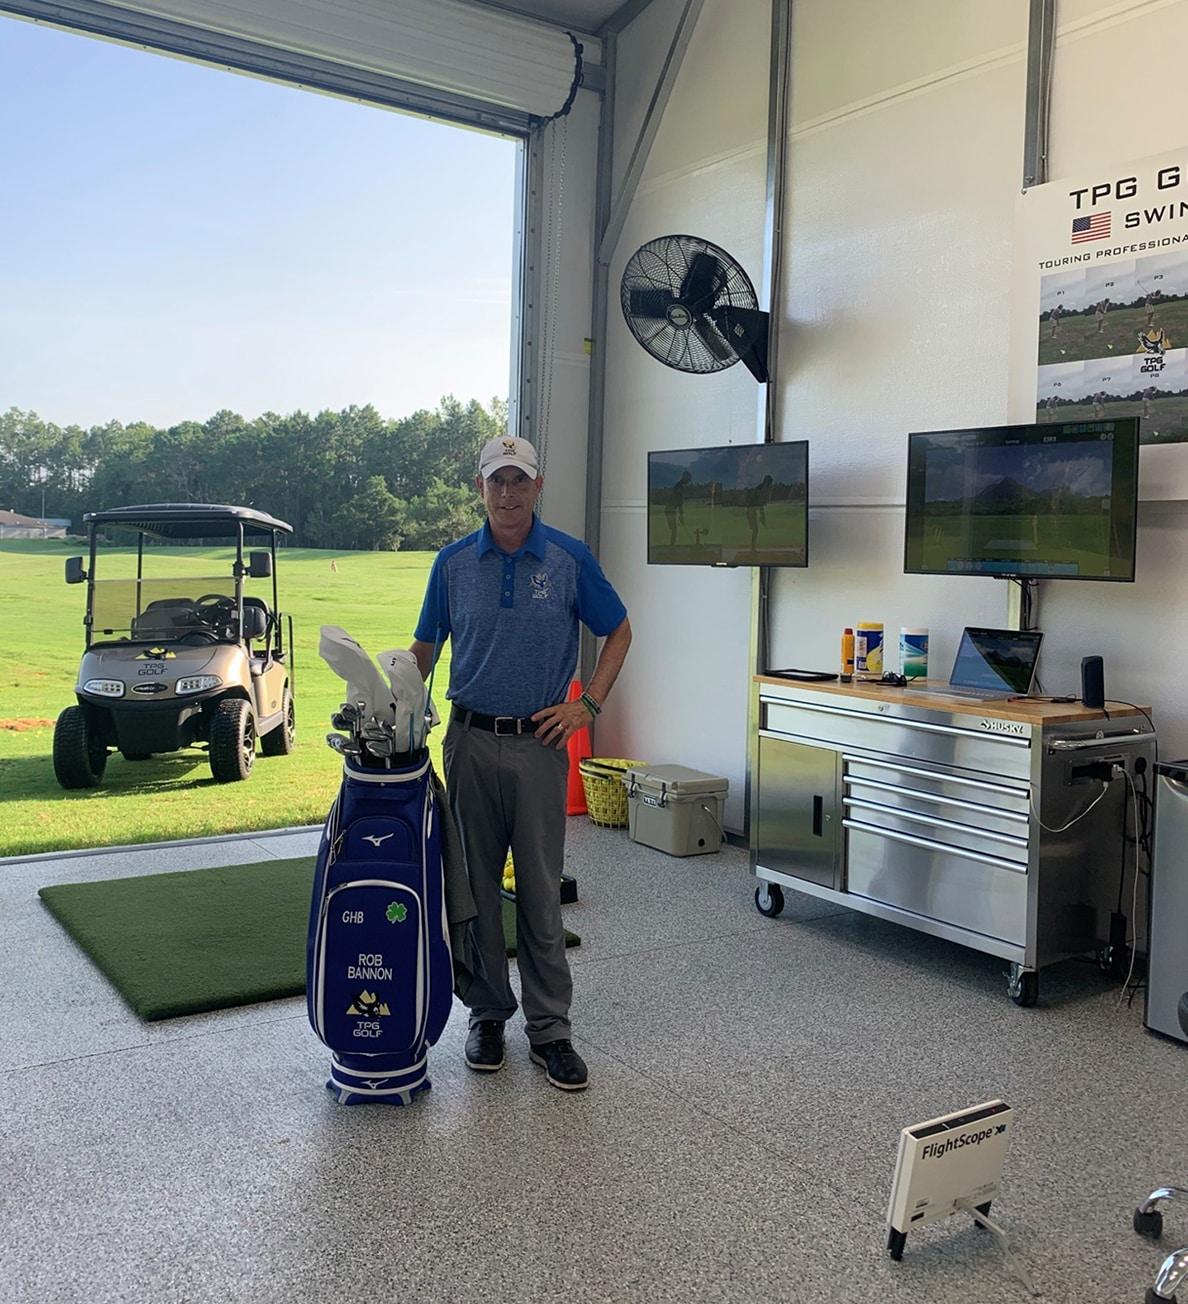 Veteran and Keiser University Graduate Leads Golf Performance Center